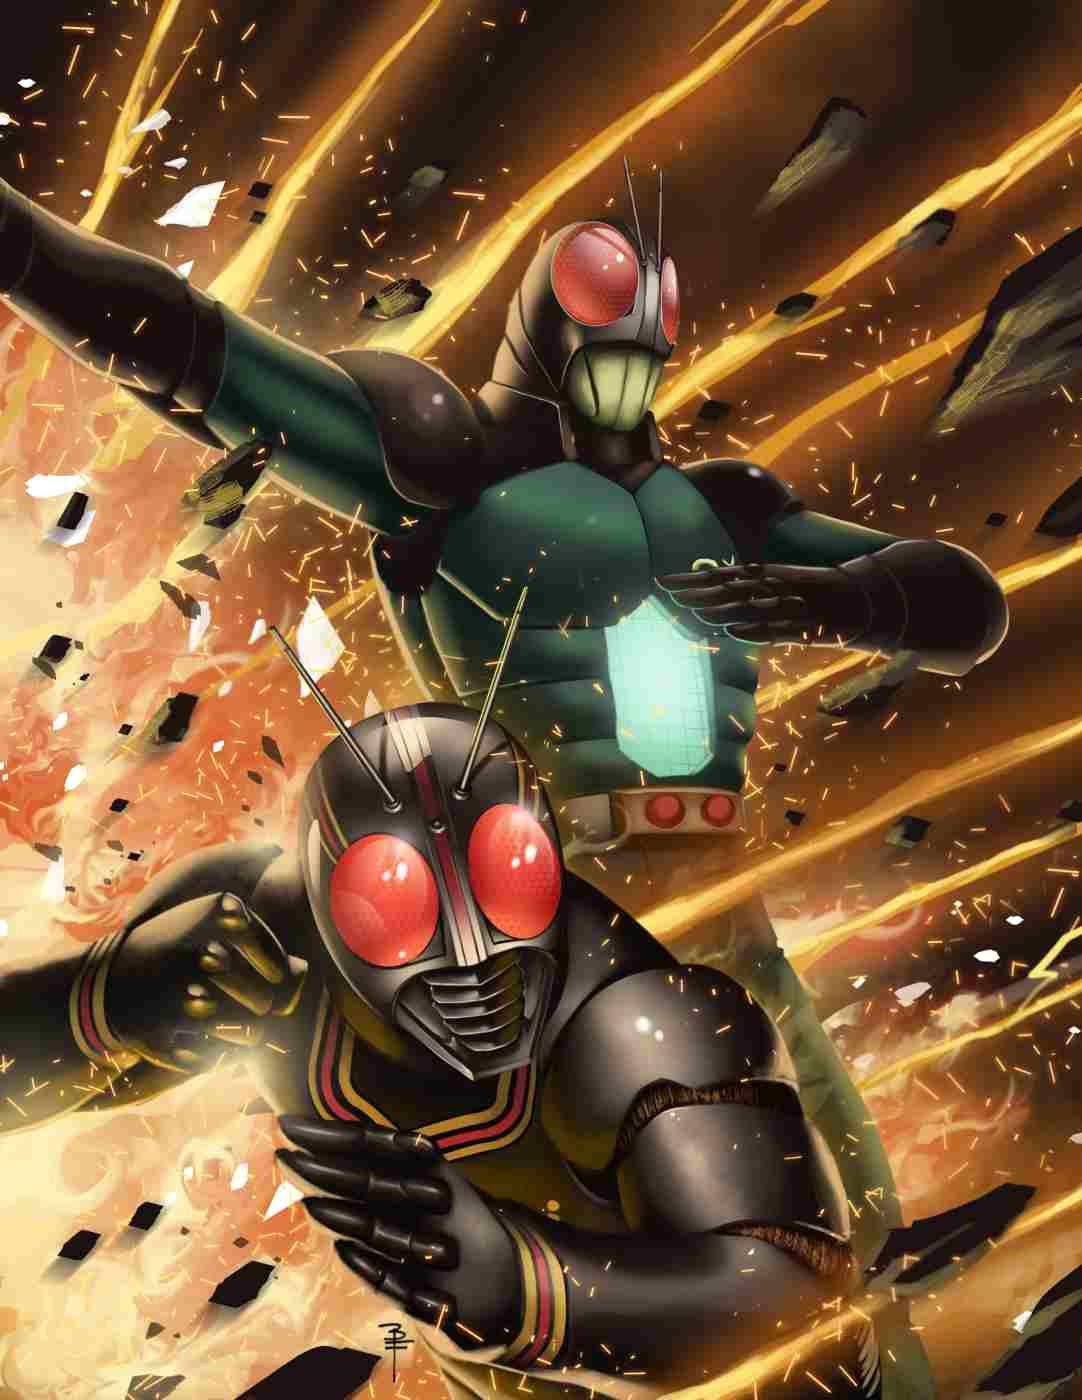 Kotaro Minami as Kamen Rider Black and Kamen Rider Black RX